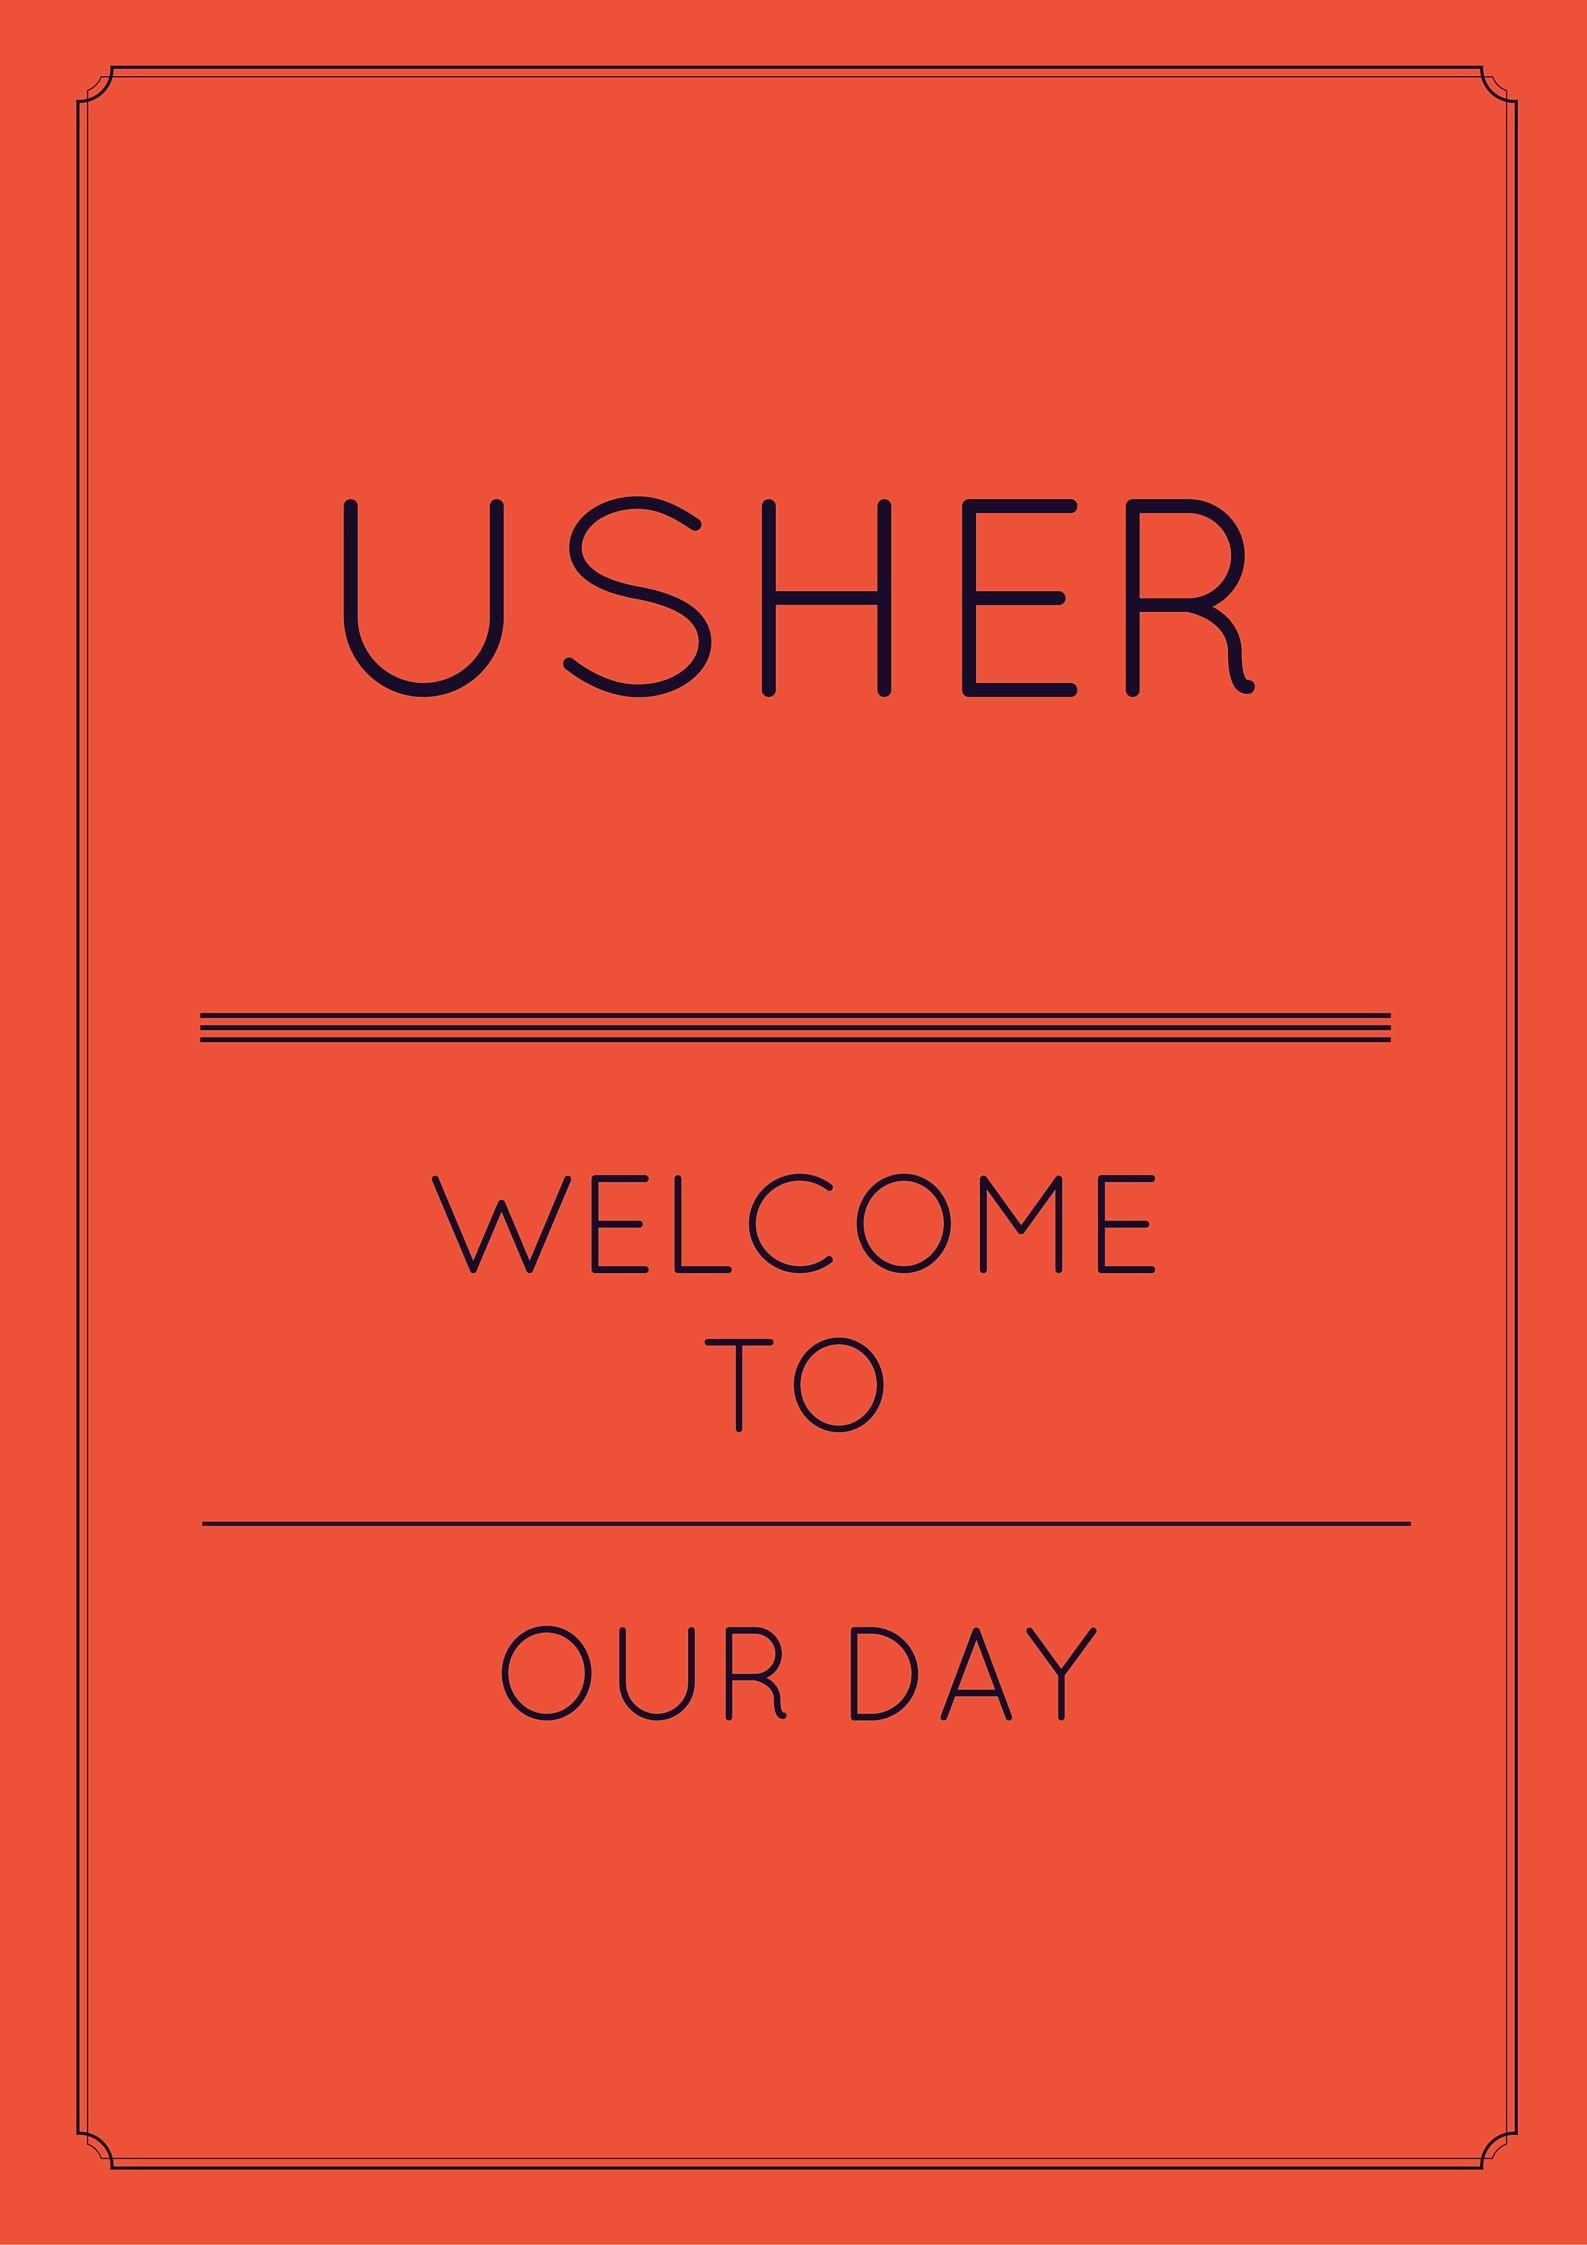 church usher anniversary poems | New albany hotel | Pinterest ...